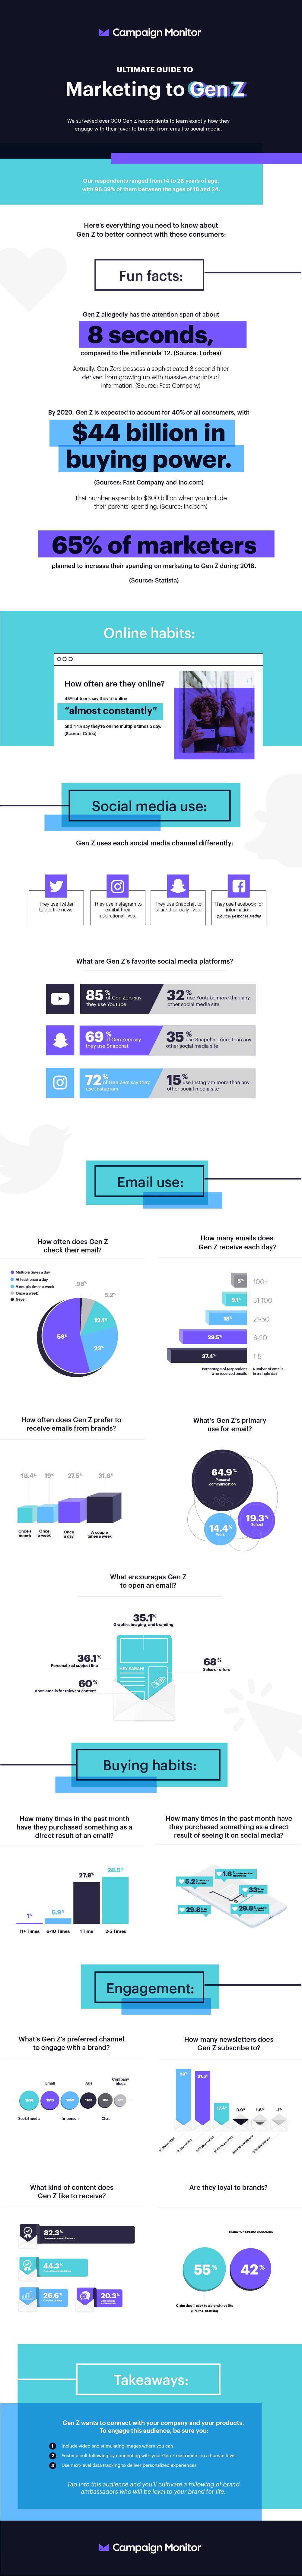 Infographic: Marketing To Generation Z